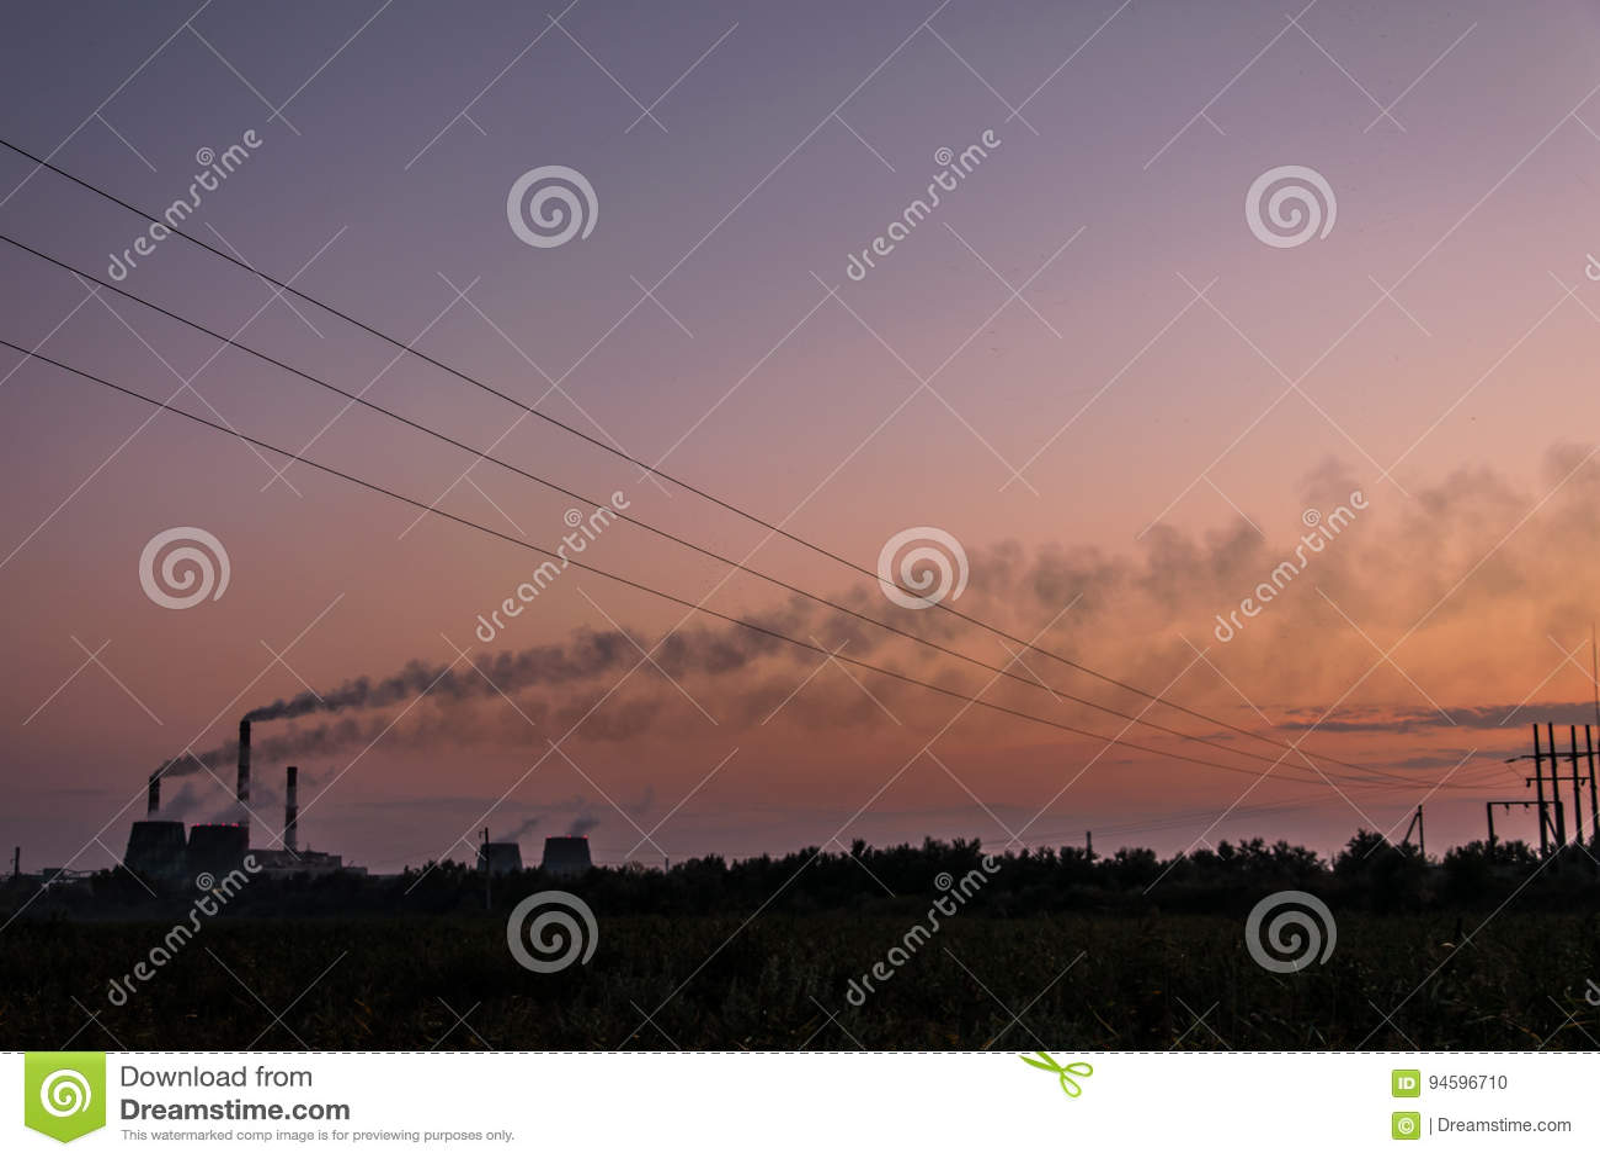 Sunset against the background of smoking chimneys